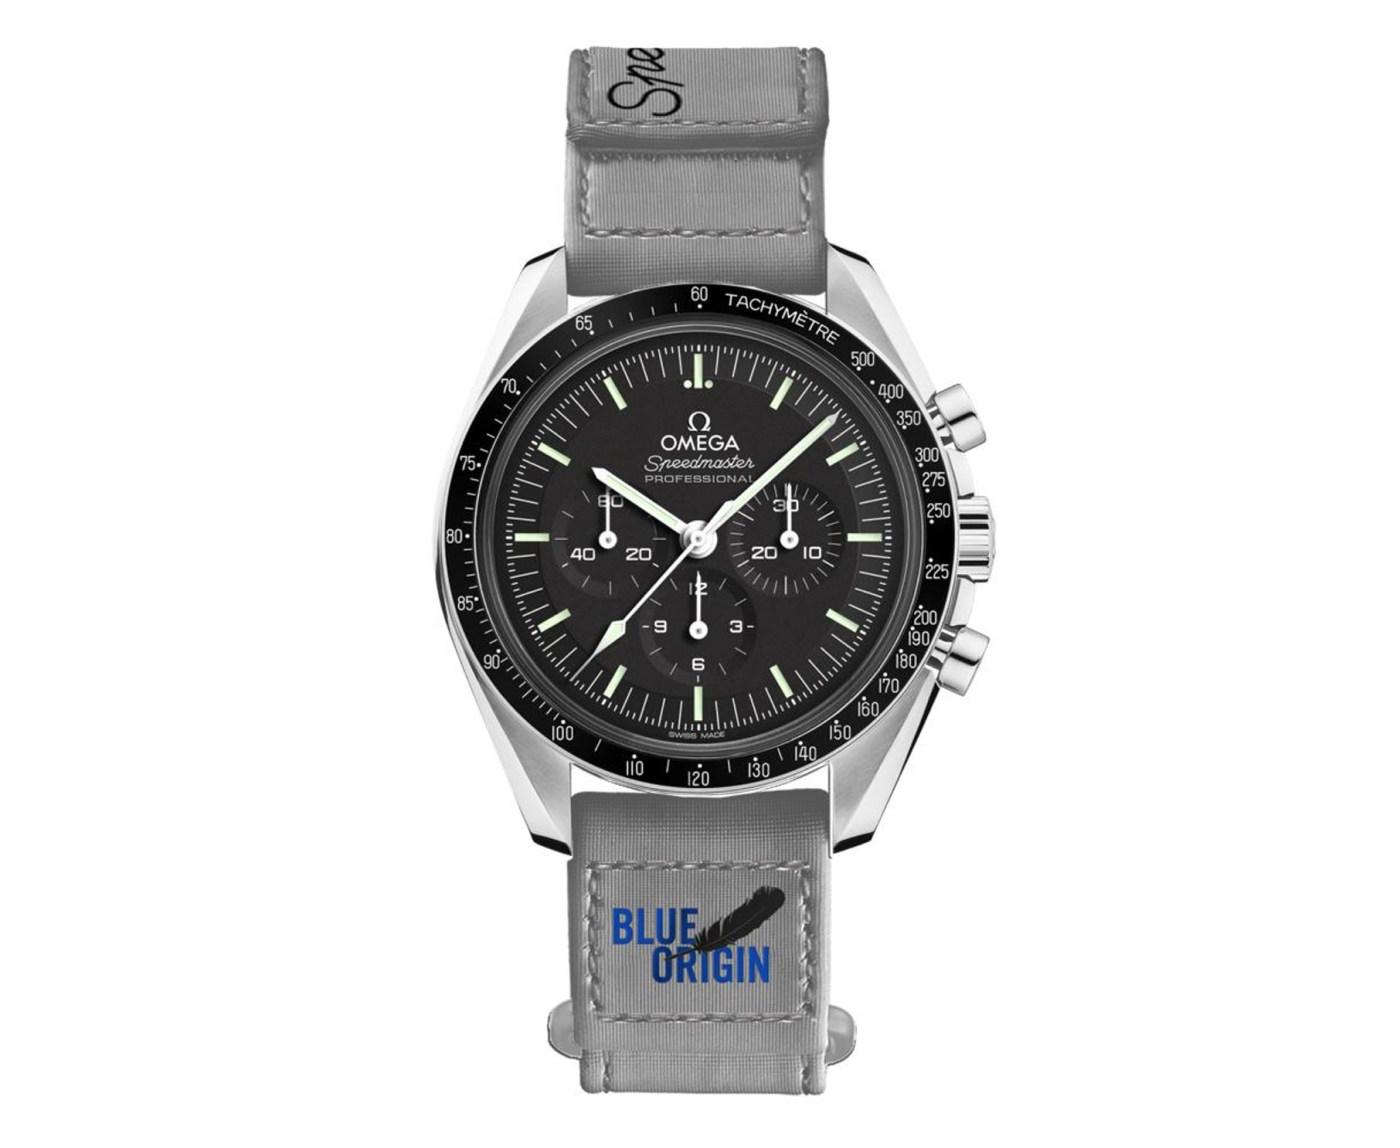 Omega Speedmaster Moonwatch Professional Master Chronometer Blue Origin